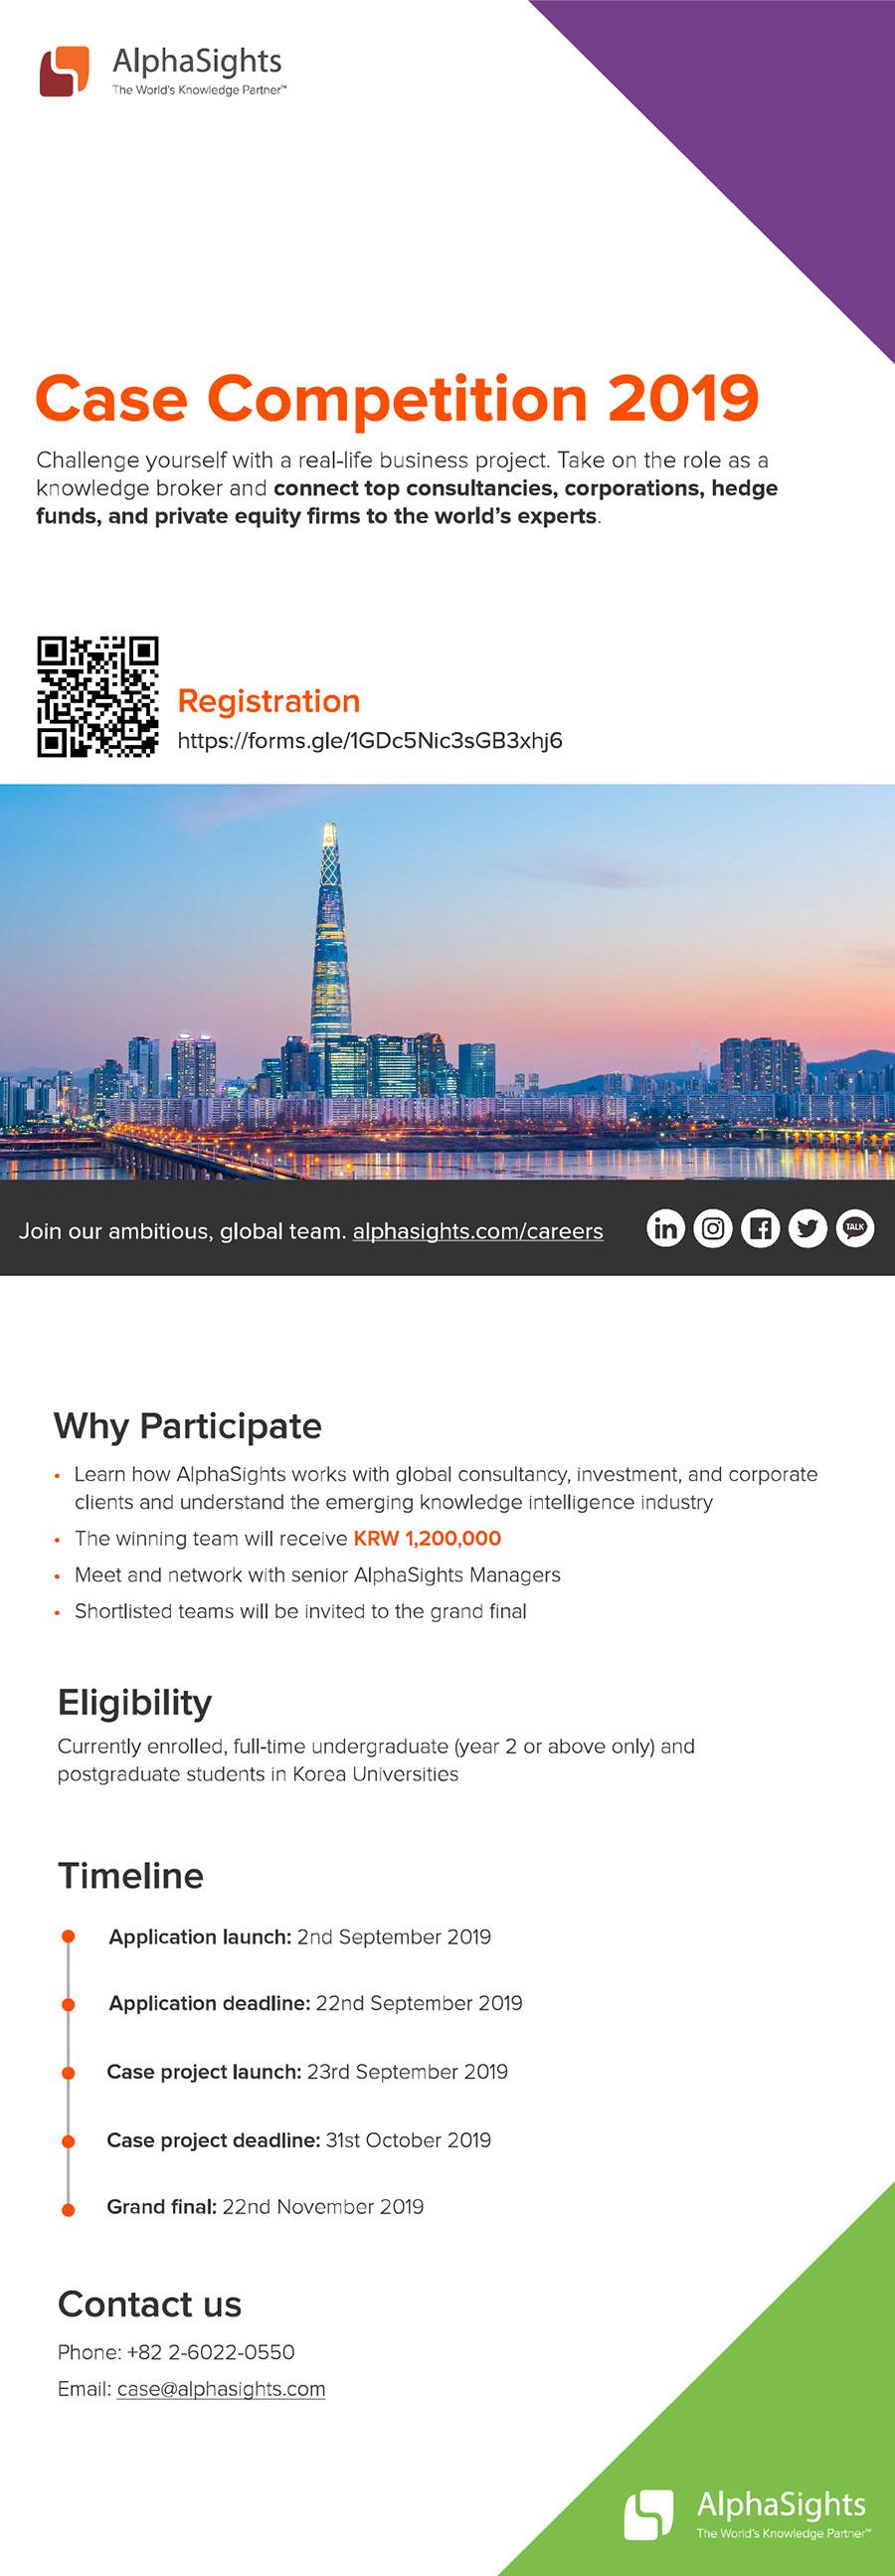 AlphaSights 2019 Case Competition 케이스 프로젝트 공모전 (~9/22)